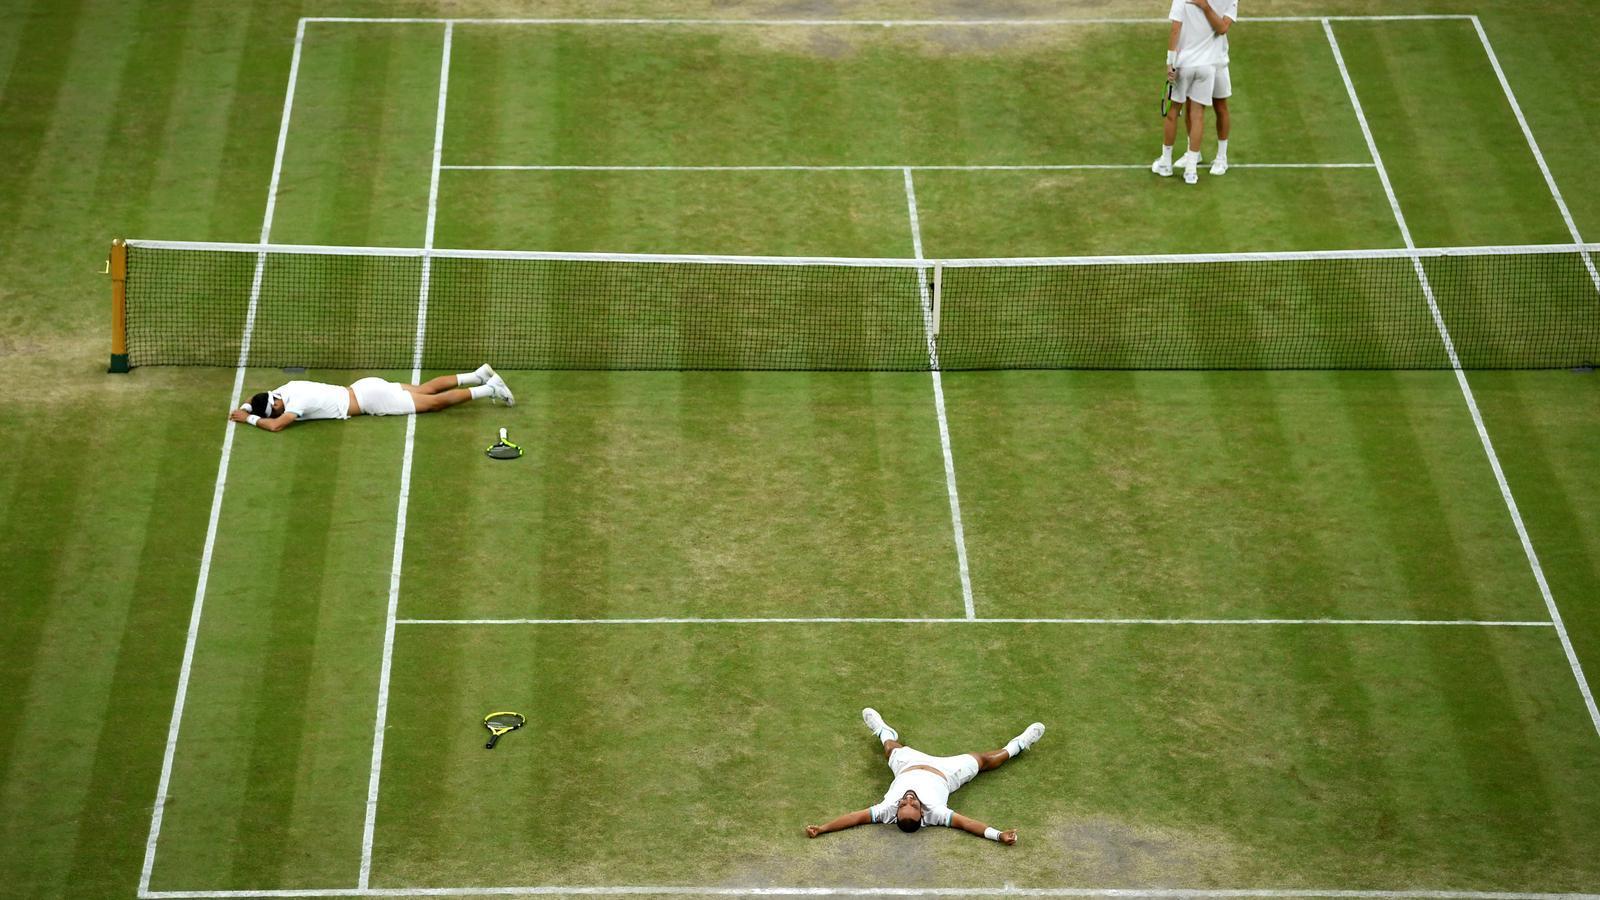 Sebastian Cabal i  Juan Robert Farah celebrant la seva victòria contra Nicolas Mahut i Edouard Roger-Vasselin al Wimbledon 2019.